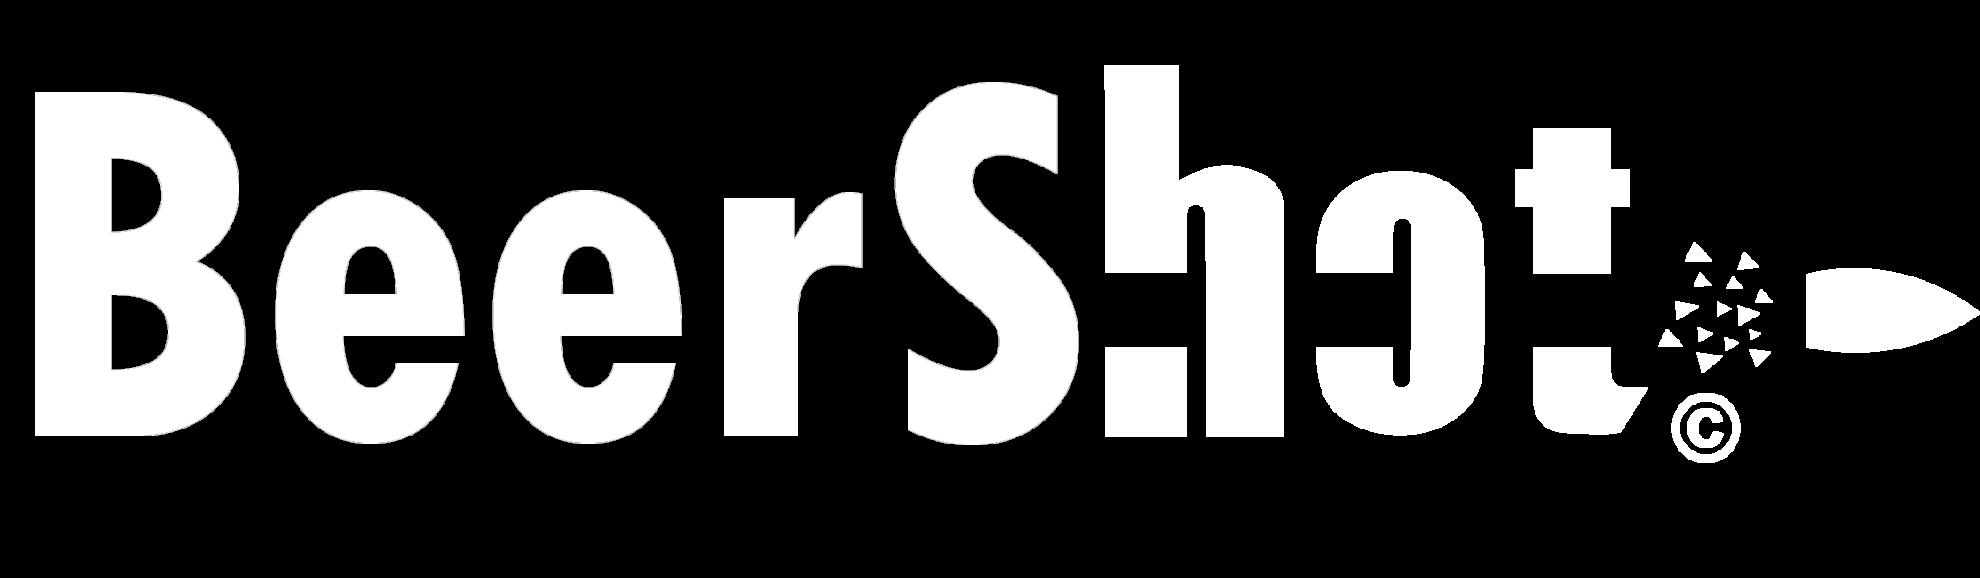 C Without URL White Logo